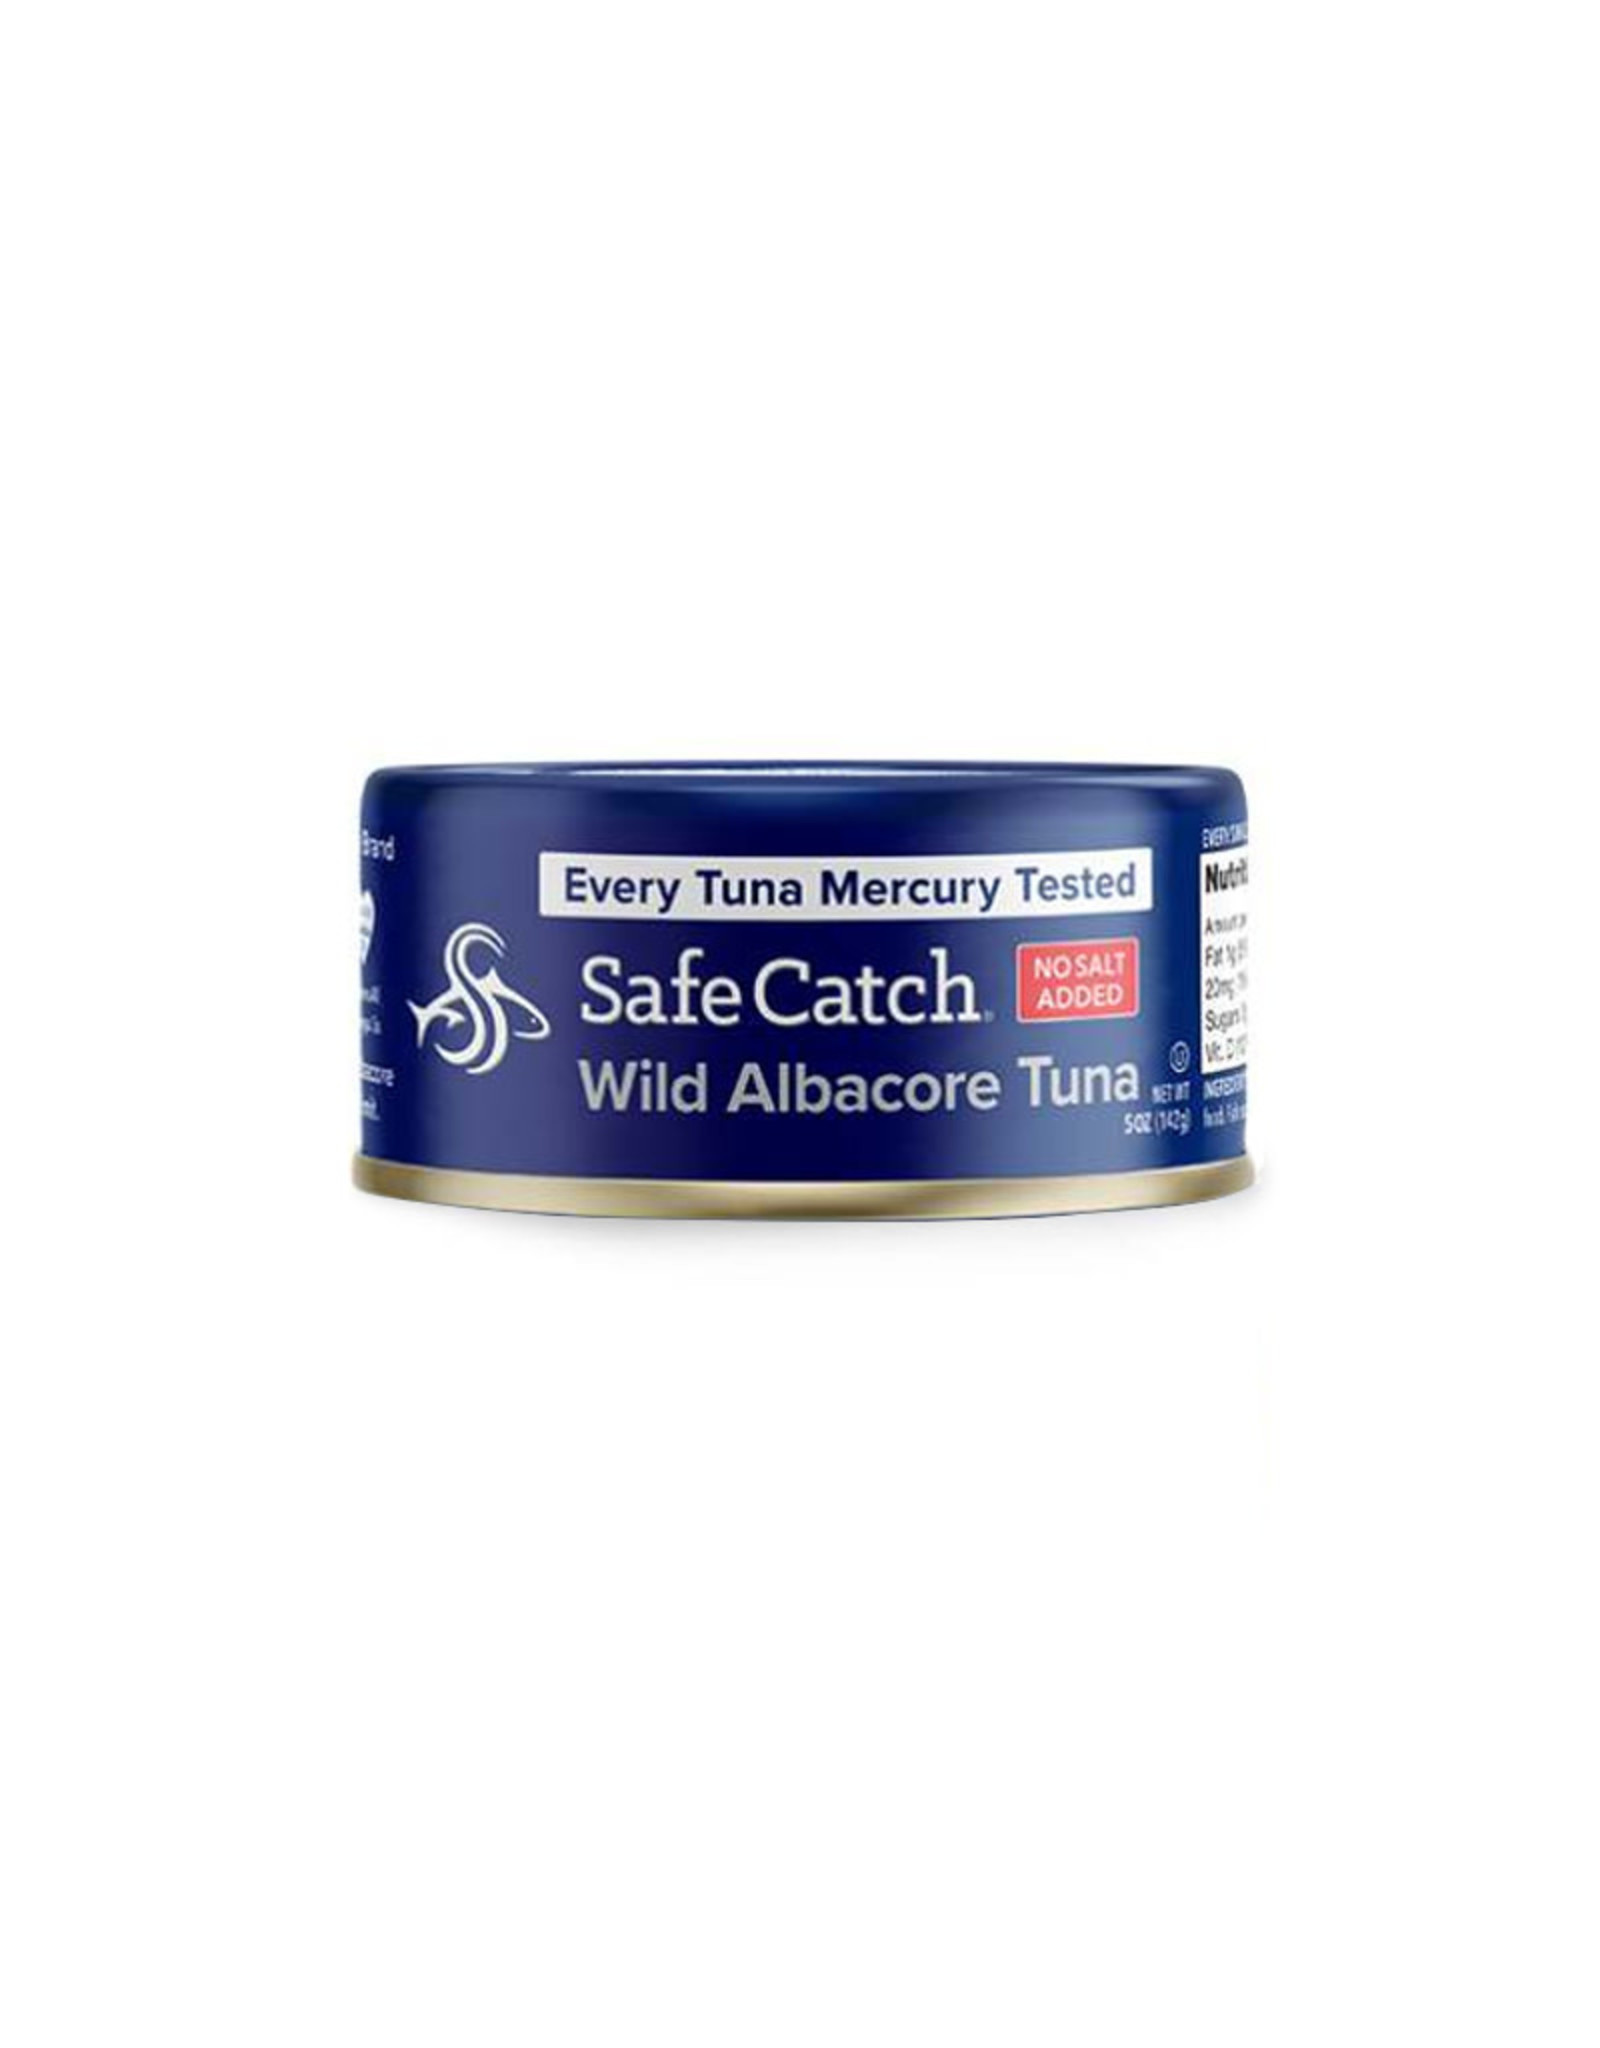 Safe Catch Safe Catch - Wild Albacore Tuna (142g)